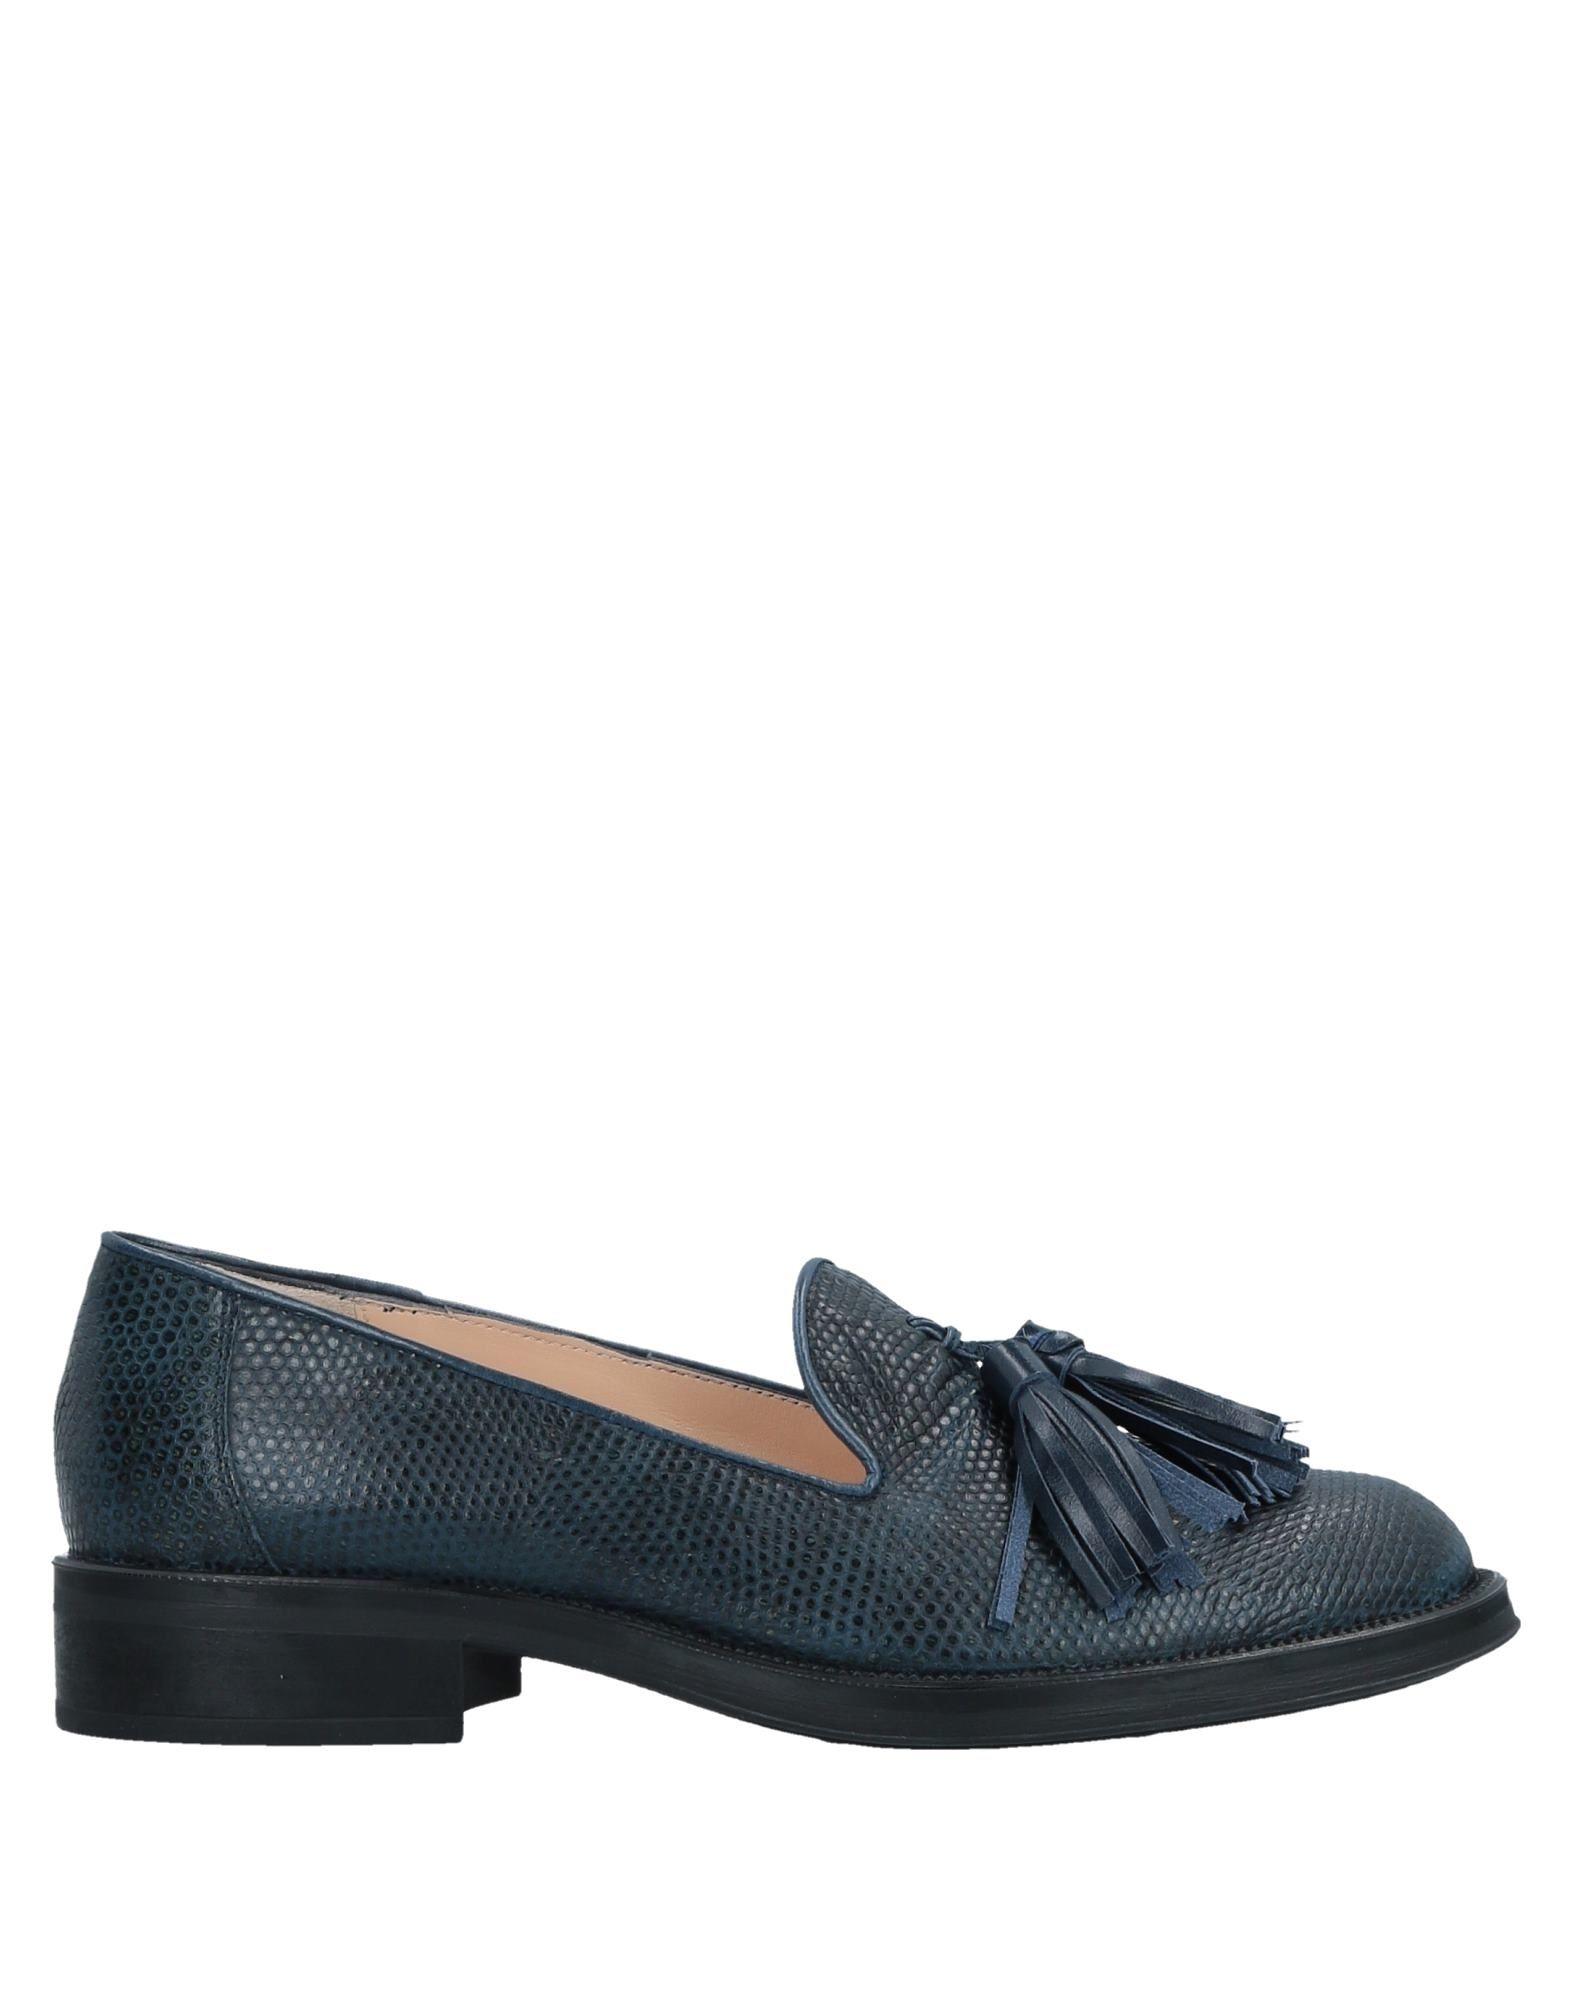 F.Lli Bruglia Mokassins Damen  11520246NMGut aussehende strapazierfähige Schuhe